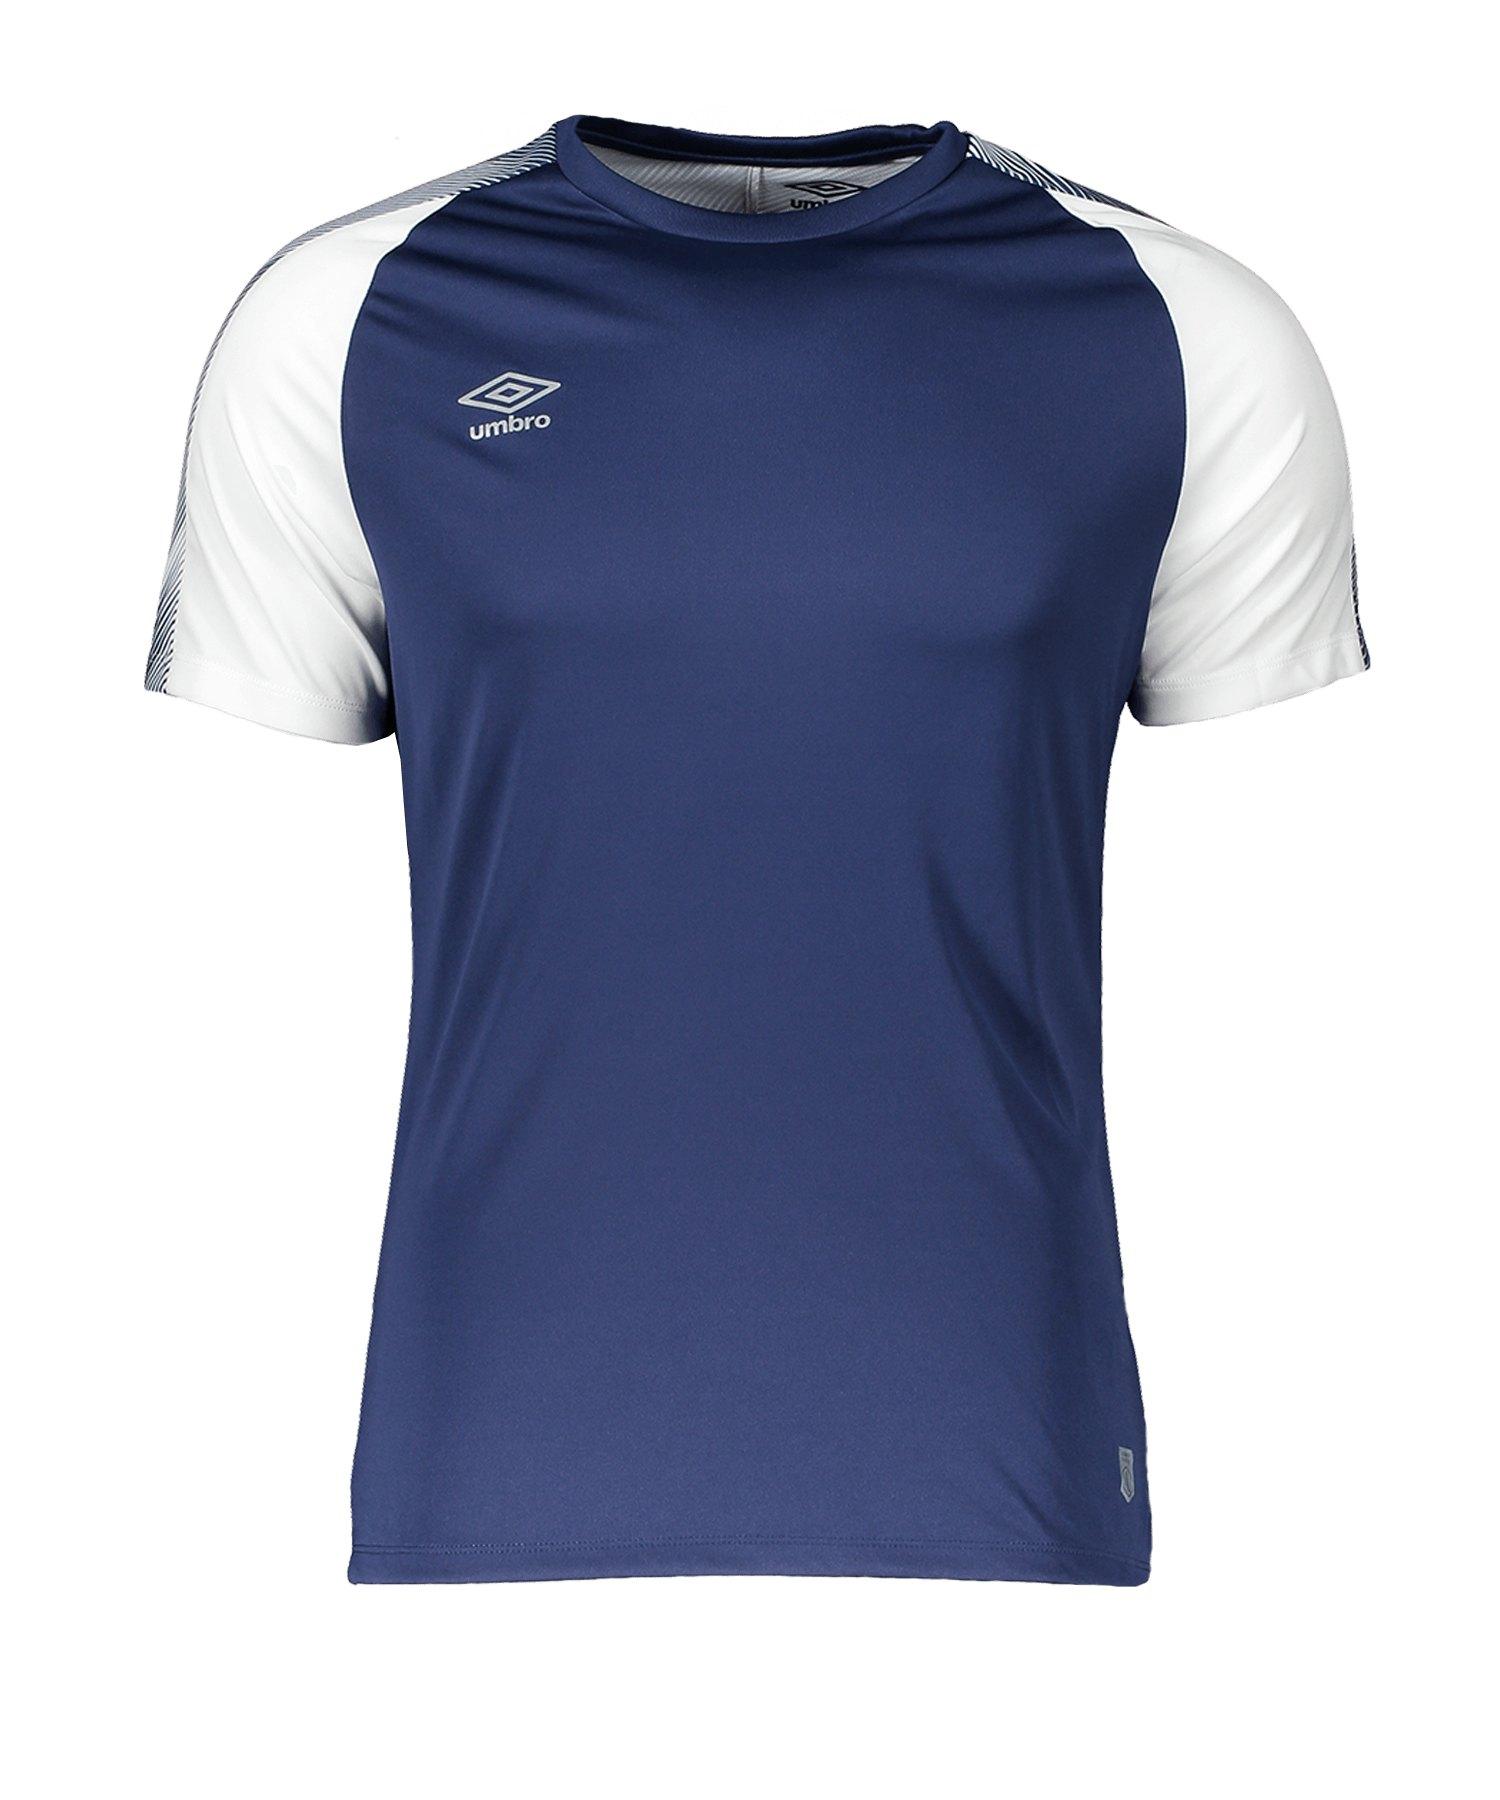 Umbro Training Jersey T-Shirt Blau Weiss HUB - blau